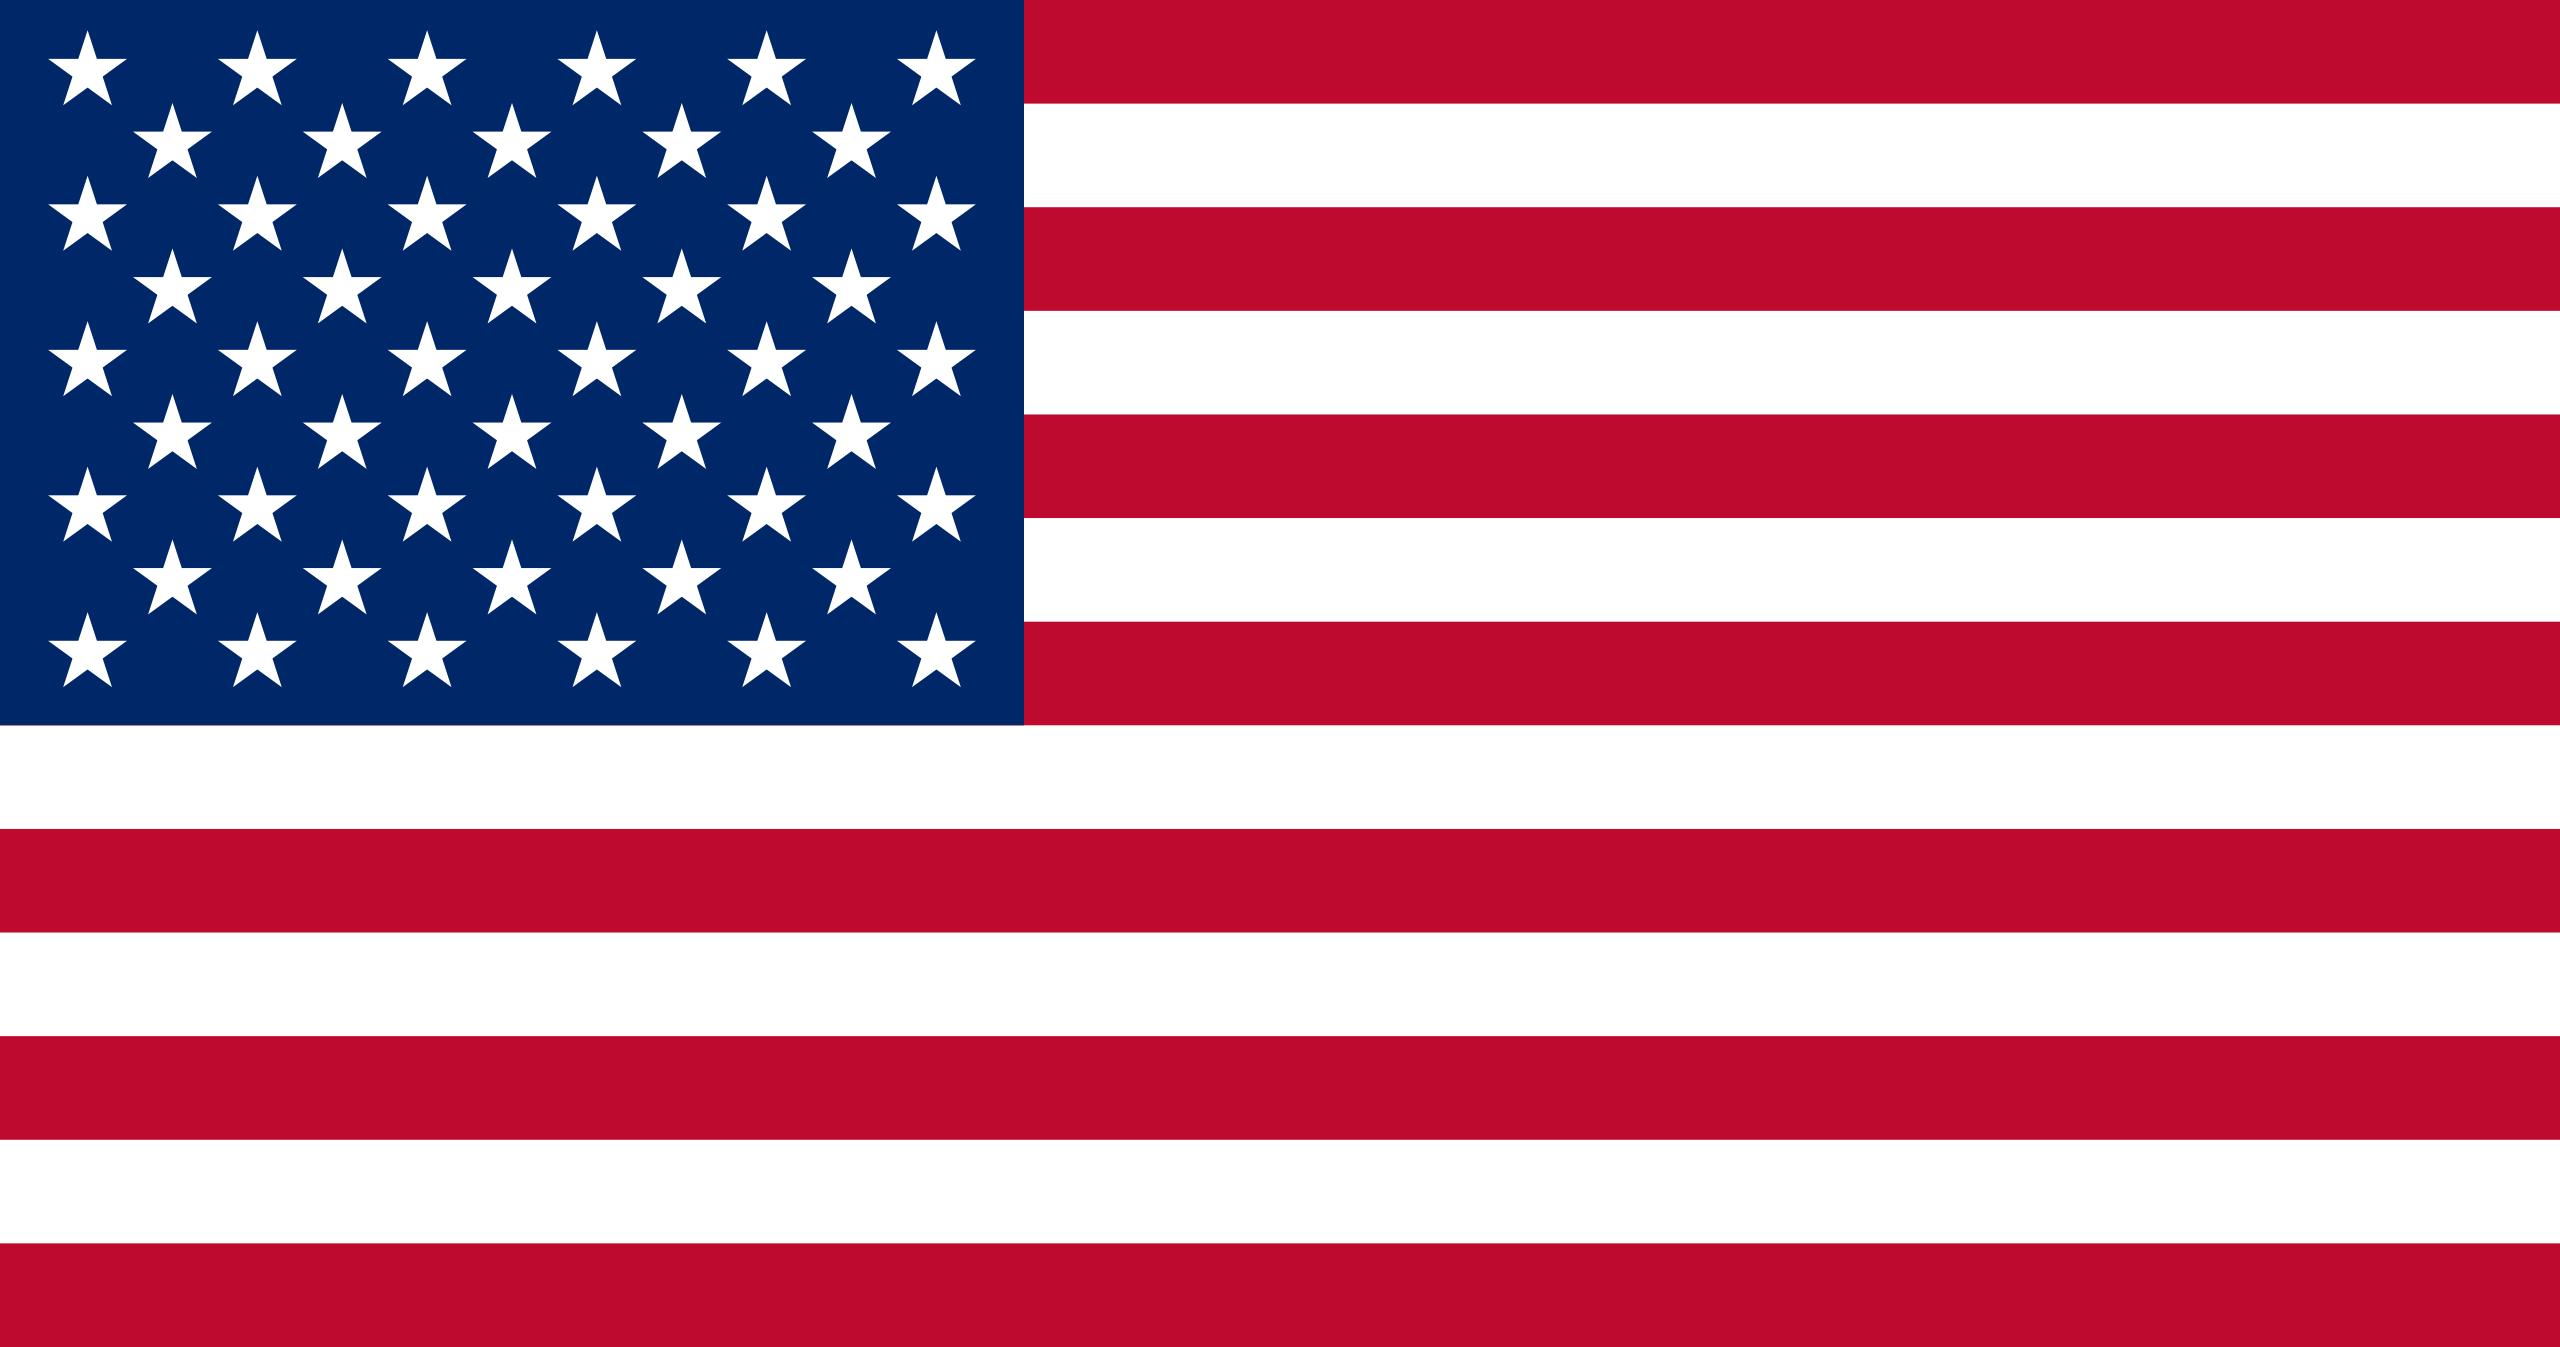 США, país, emblema, insignia, символ - Обои HD - Профессор falken.com